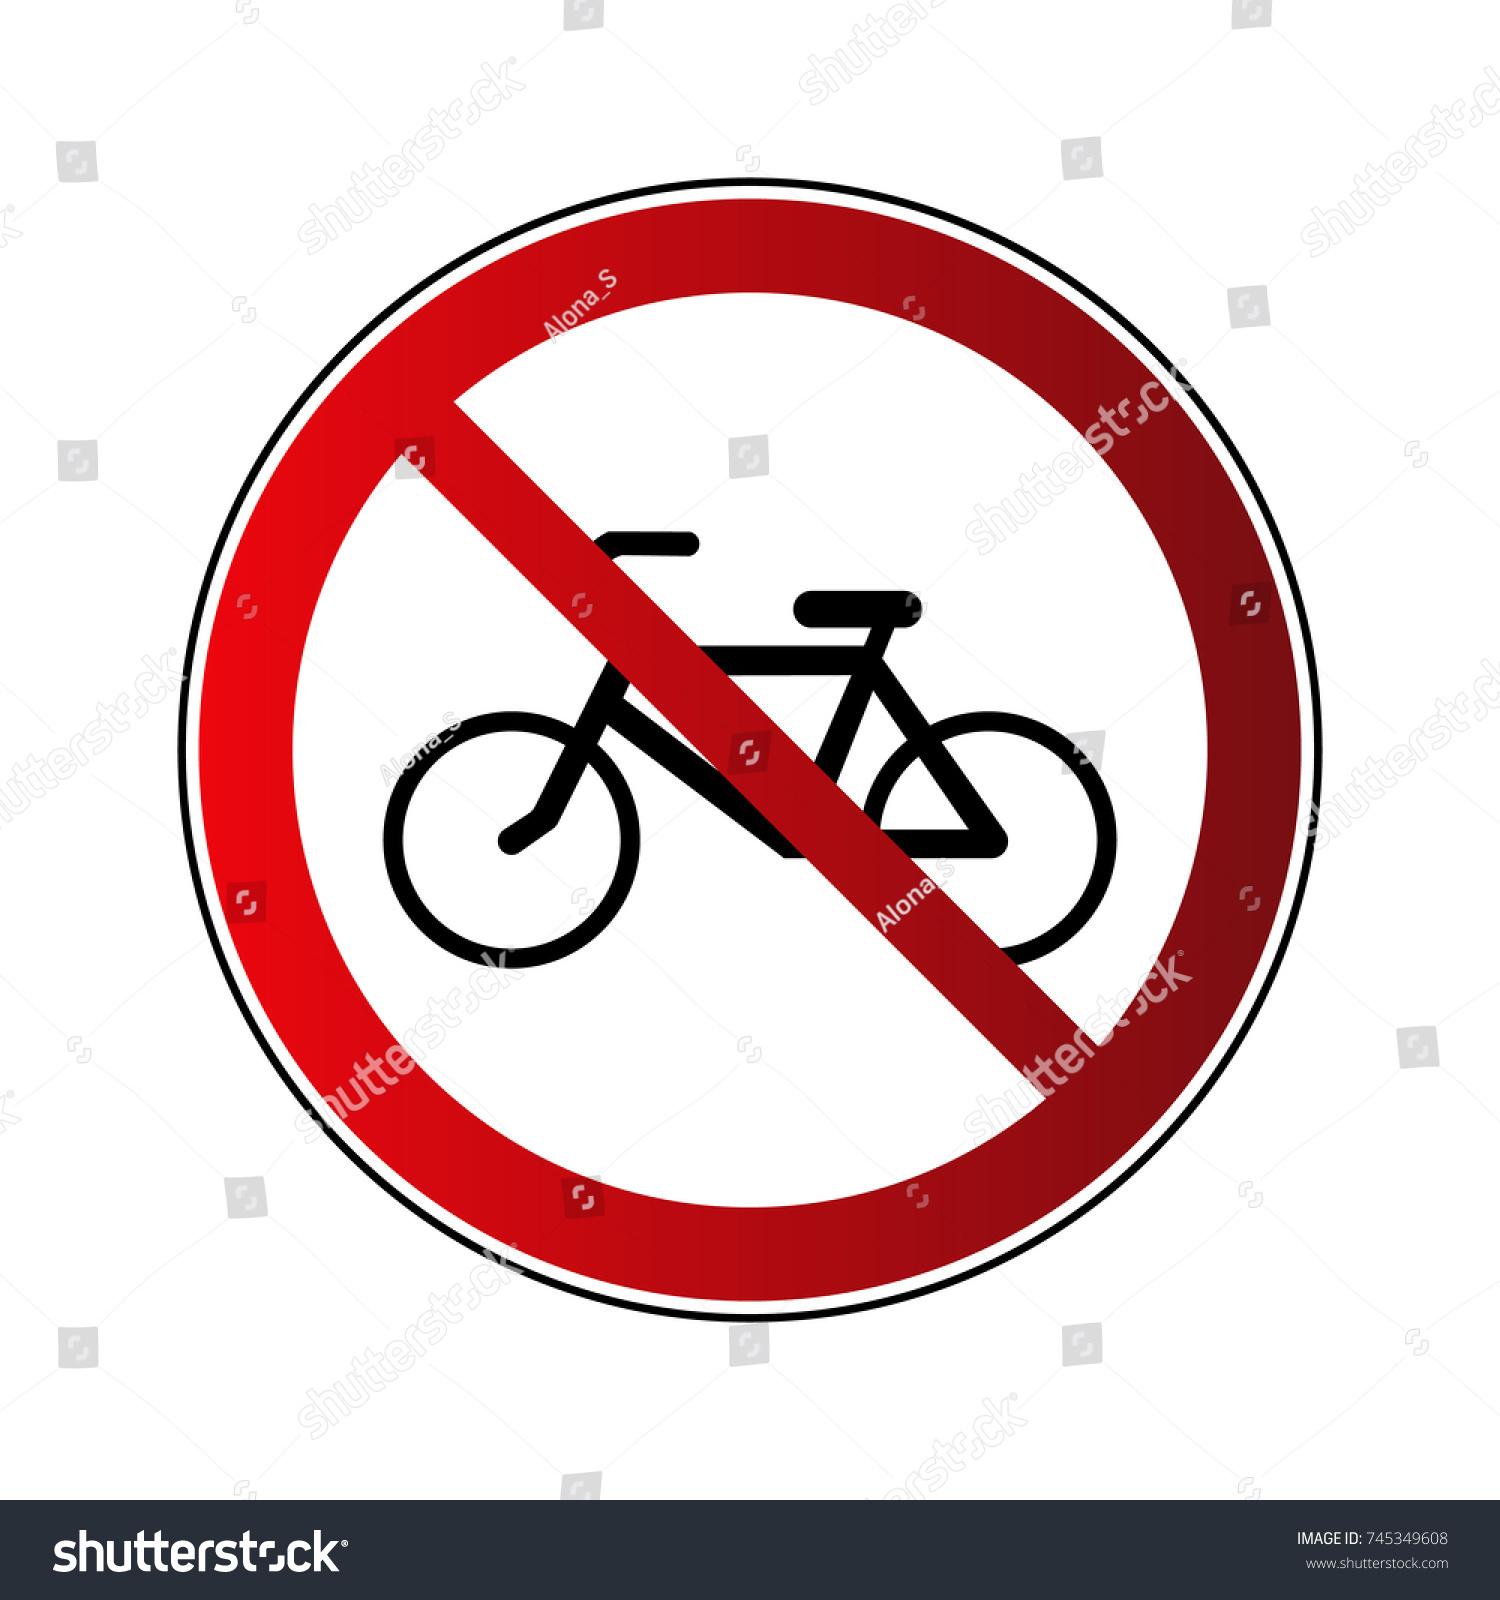 free photo no bicycle